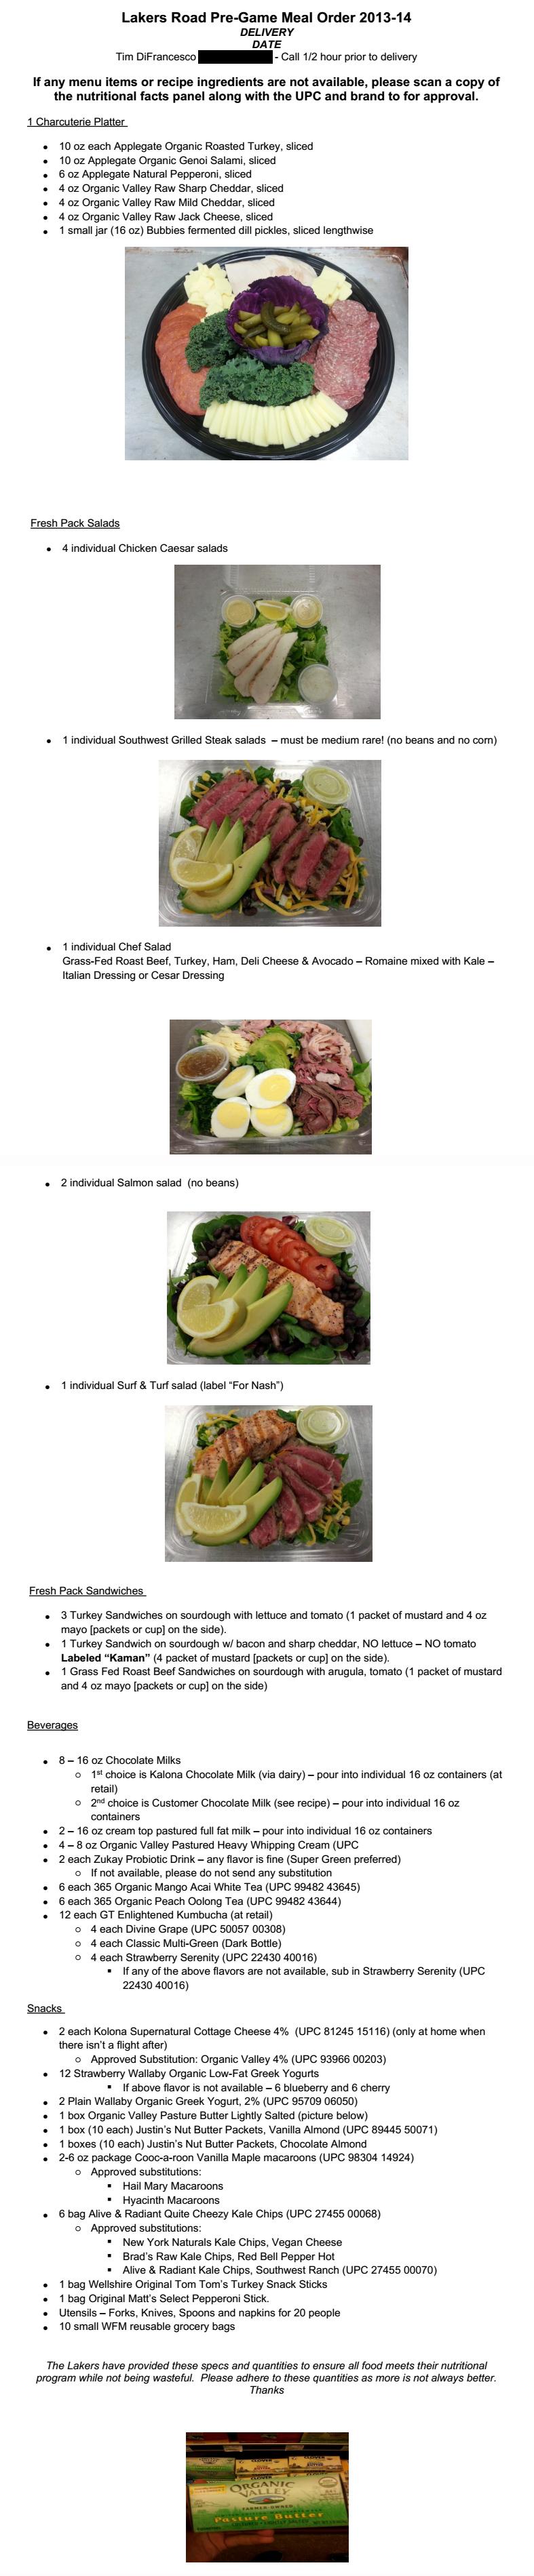 deep nutrition made simple start here u2013 drcate com